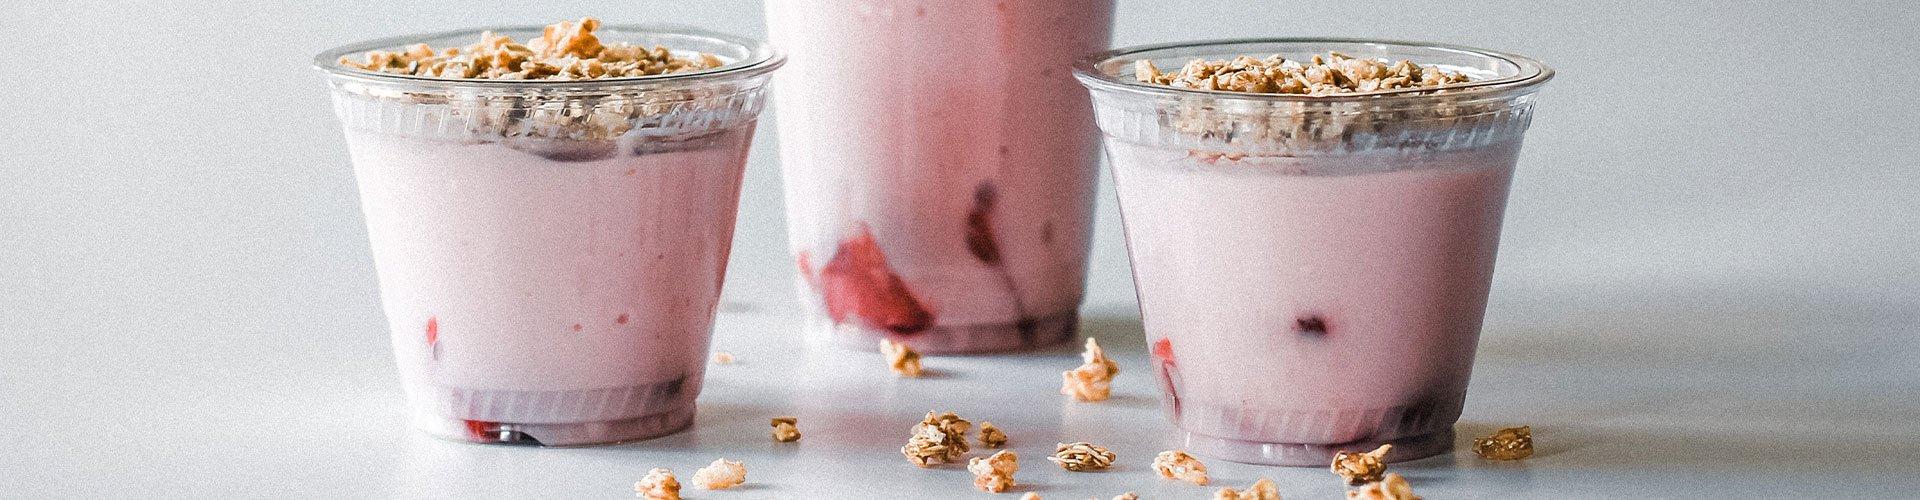 Yogurt parfaits made in-house